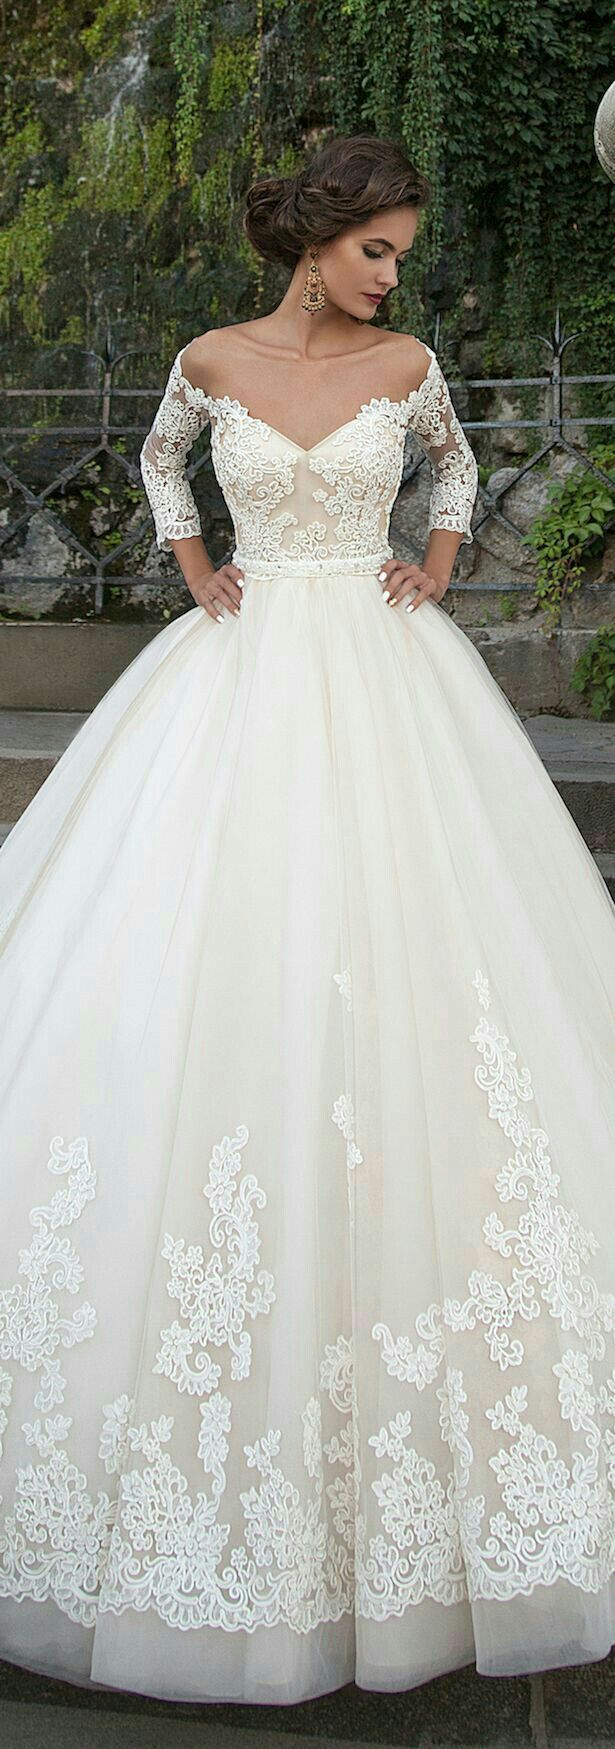 Harry potter wedding dress  Harry Potter Imaginas y Preferencias  Wedding dress Wedding and